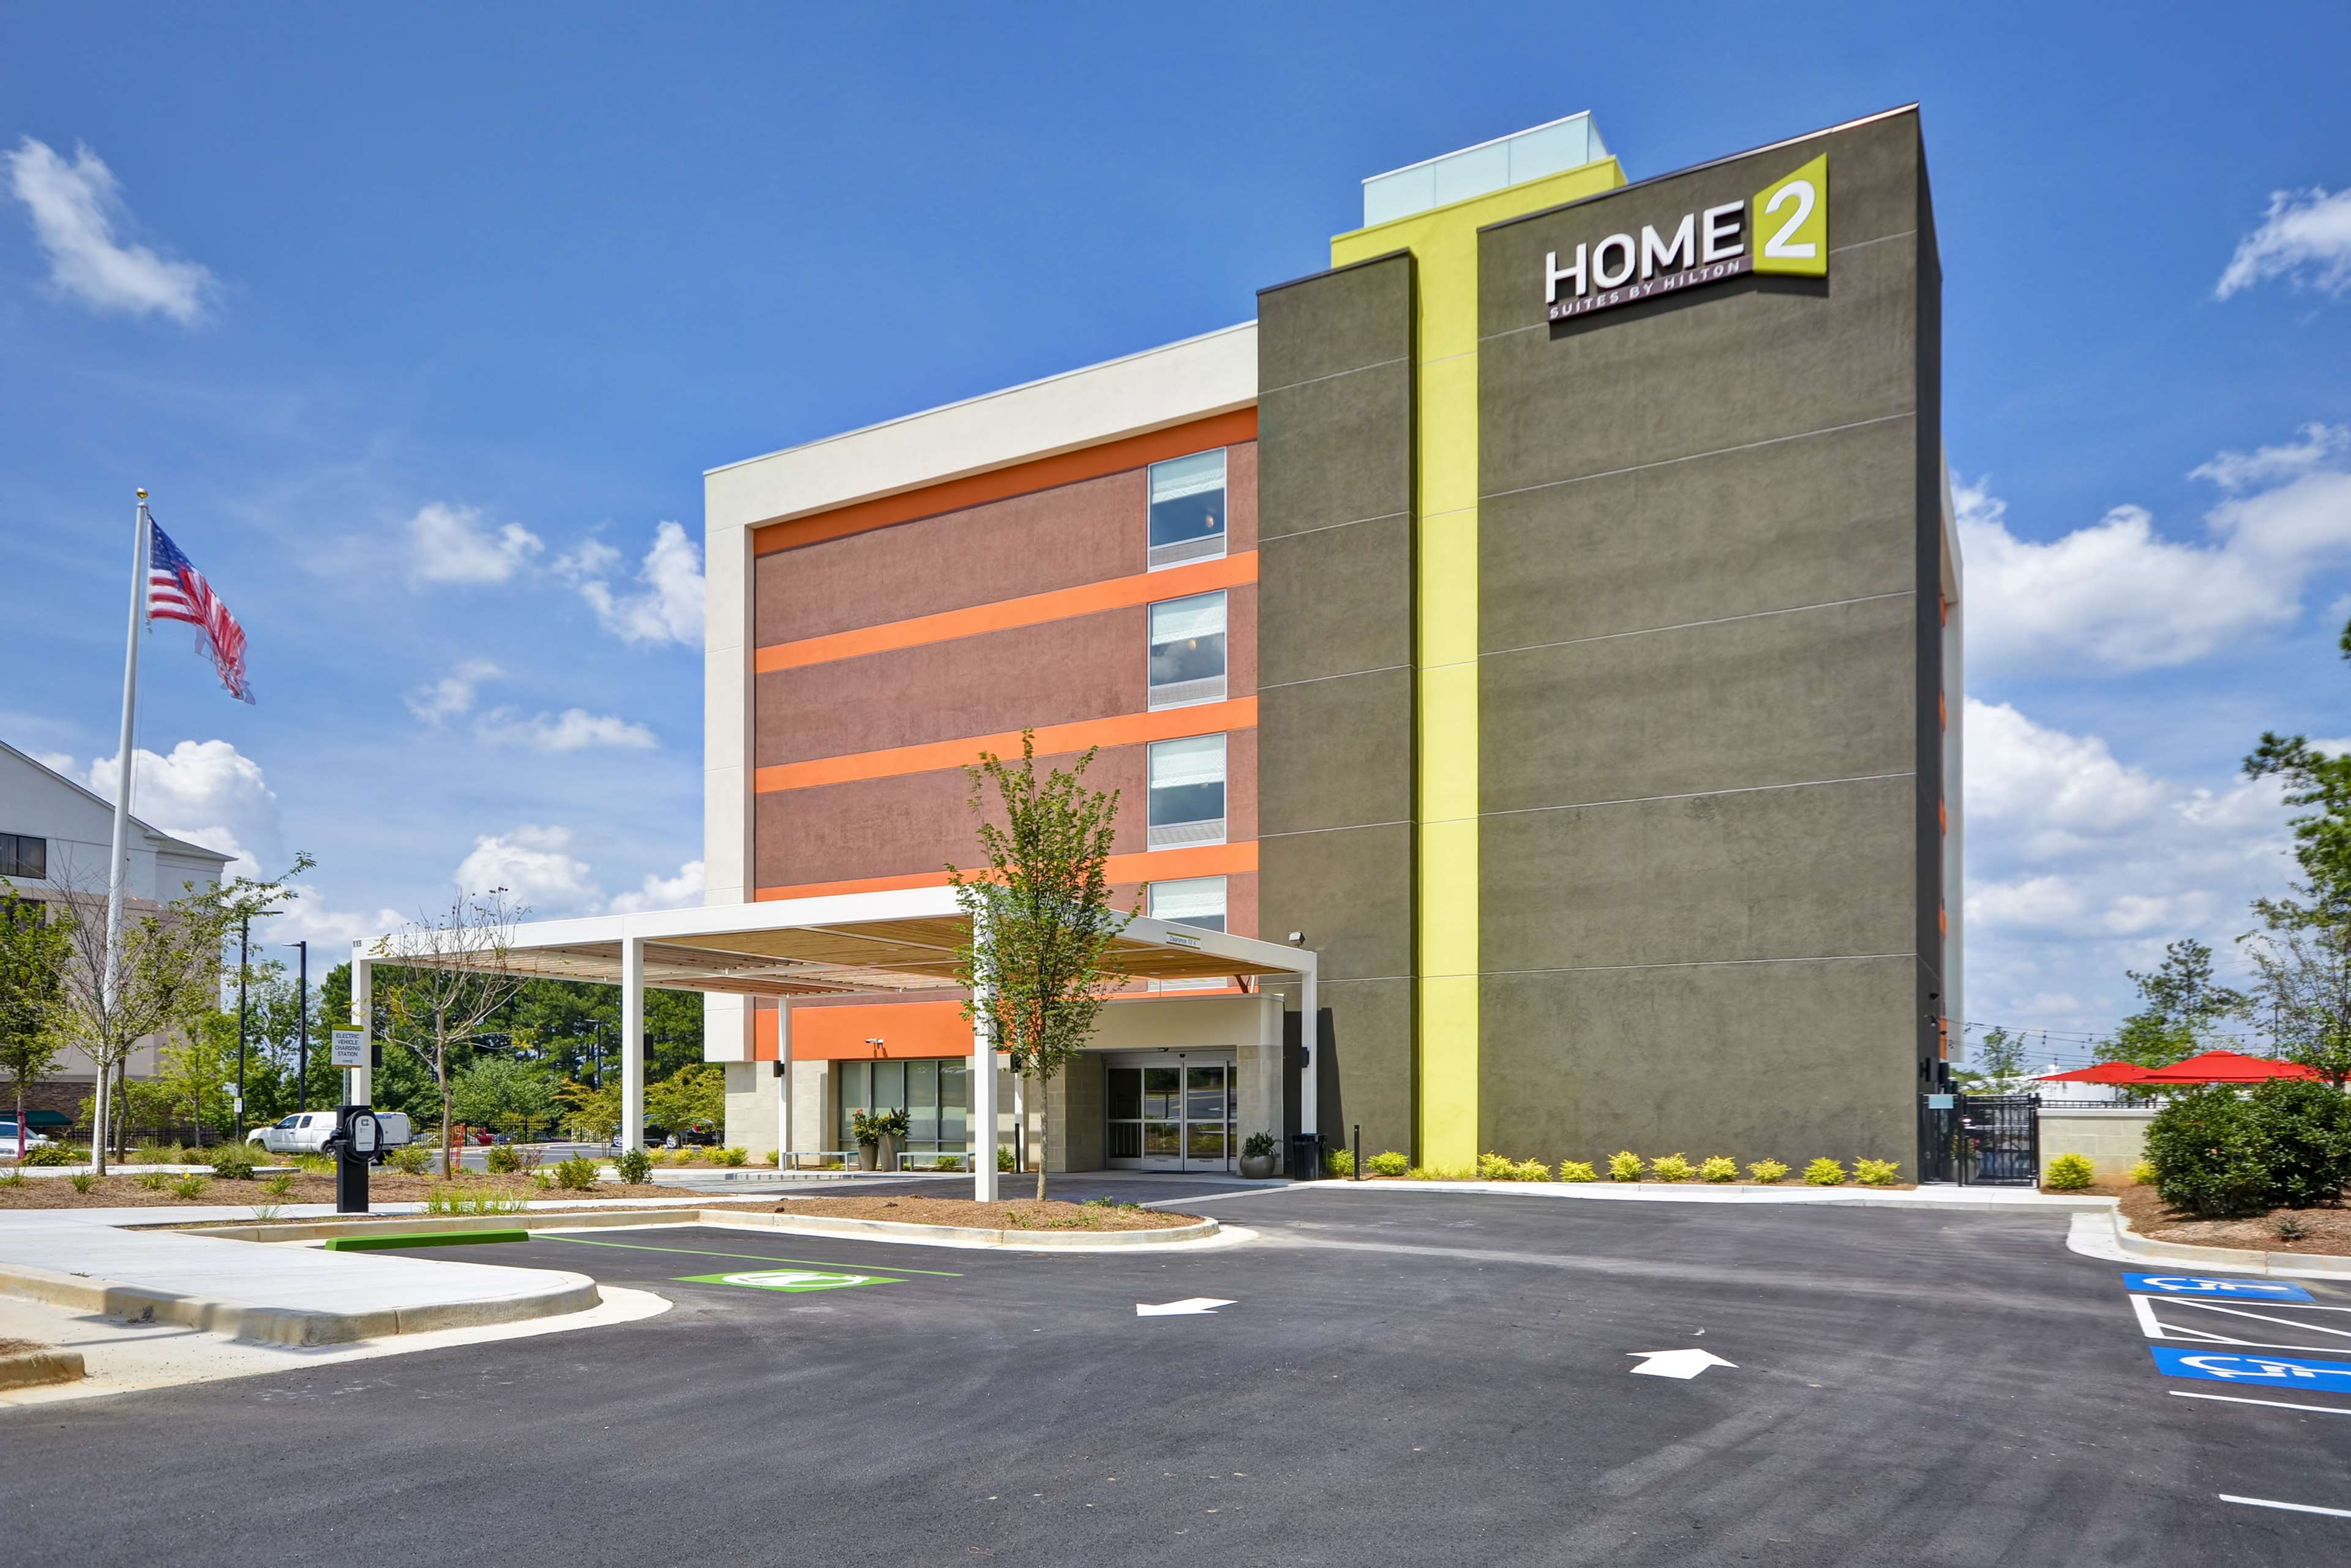 Home2 Suites by Hilton Atlanta West Lithia Springs image 1